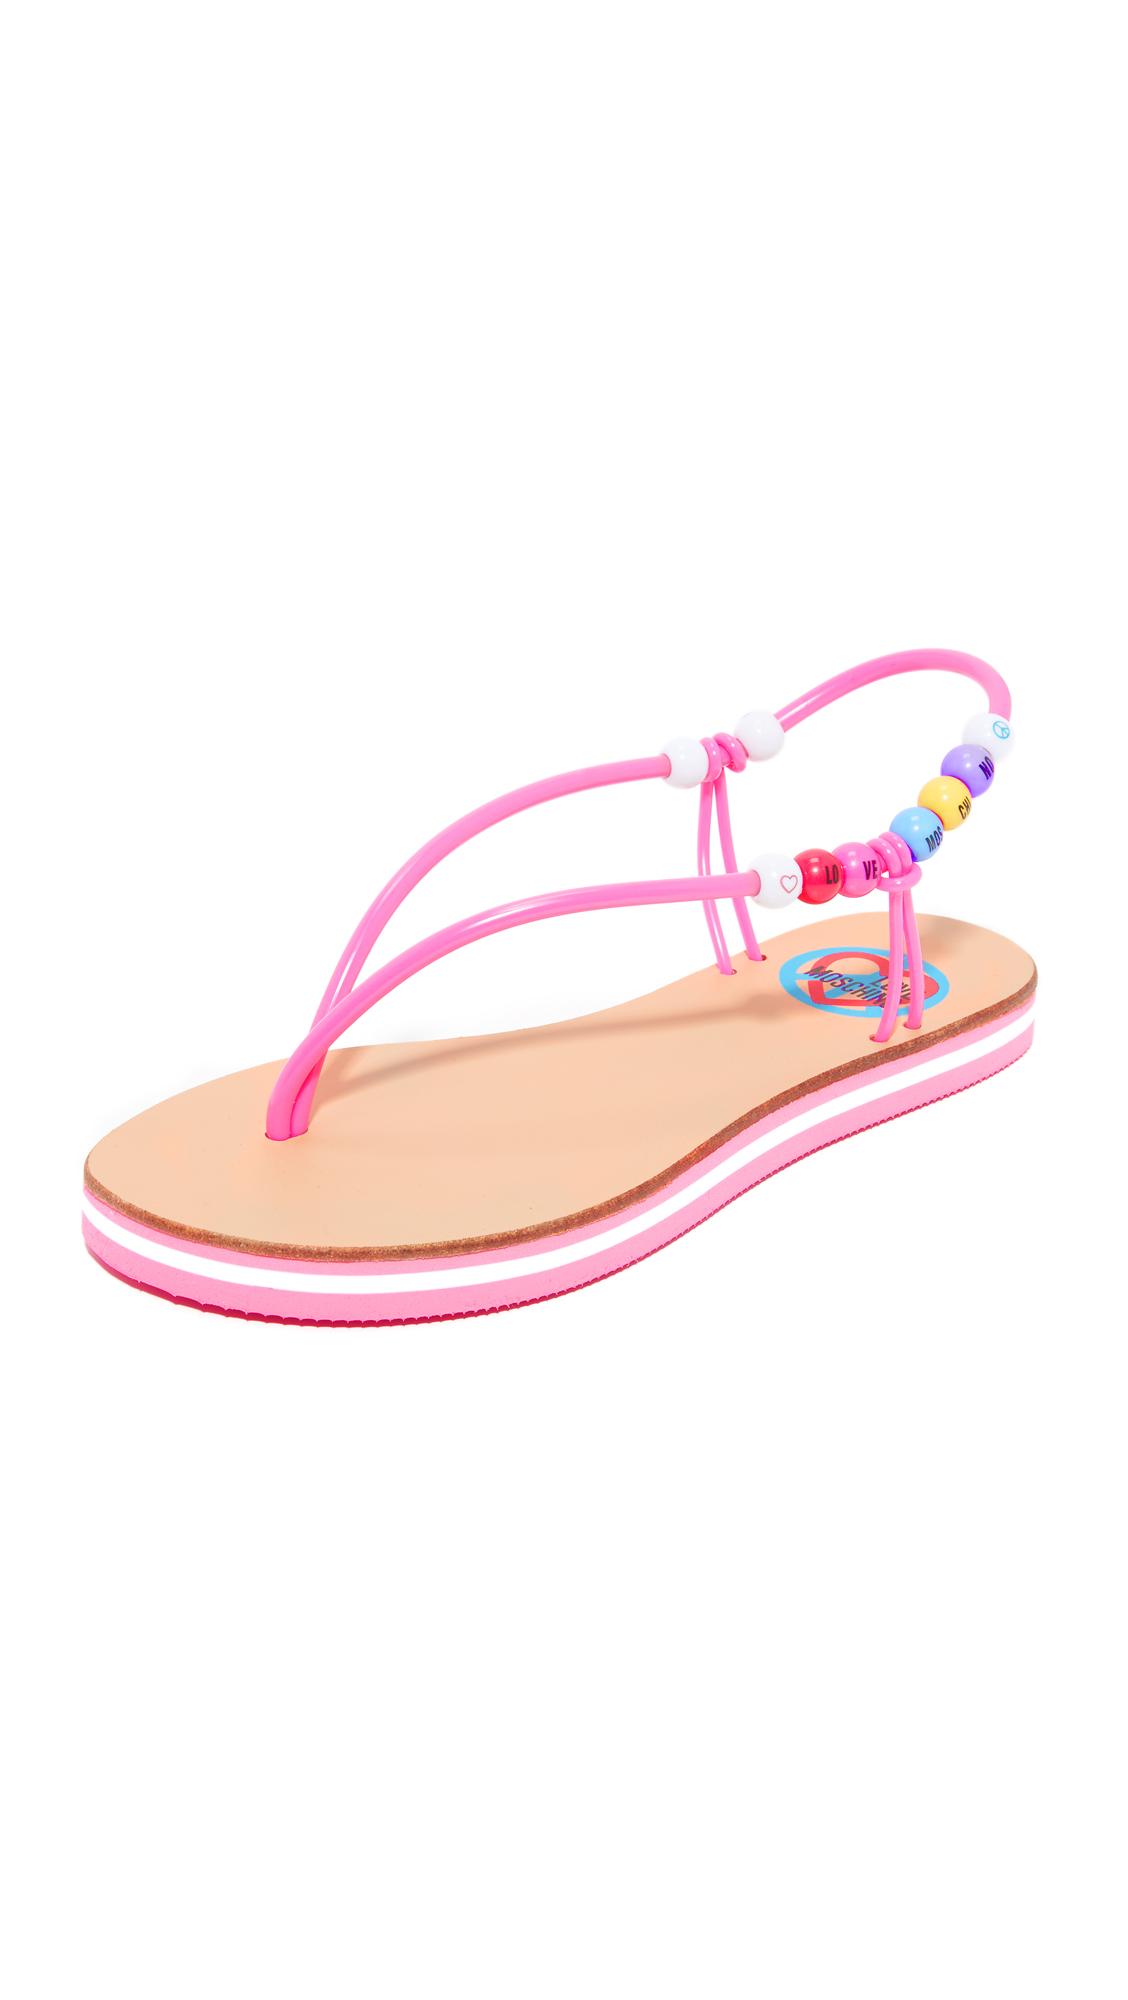 Moschino Love Moschino Sandals - Fuchsia at Shopbop